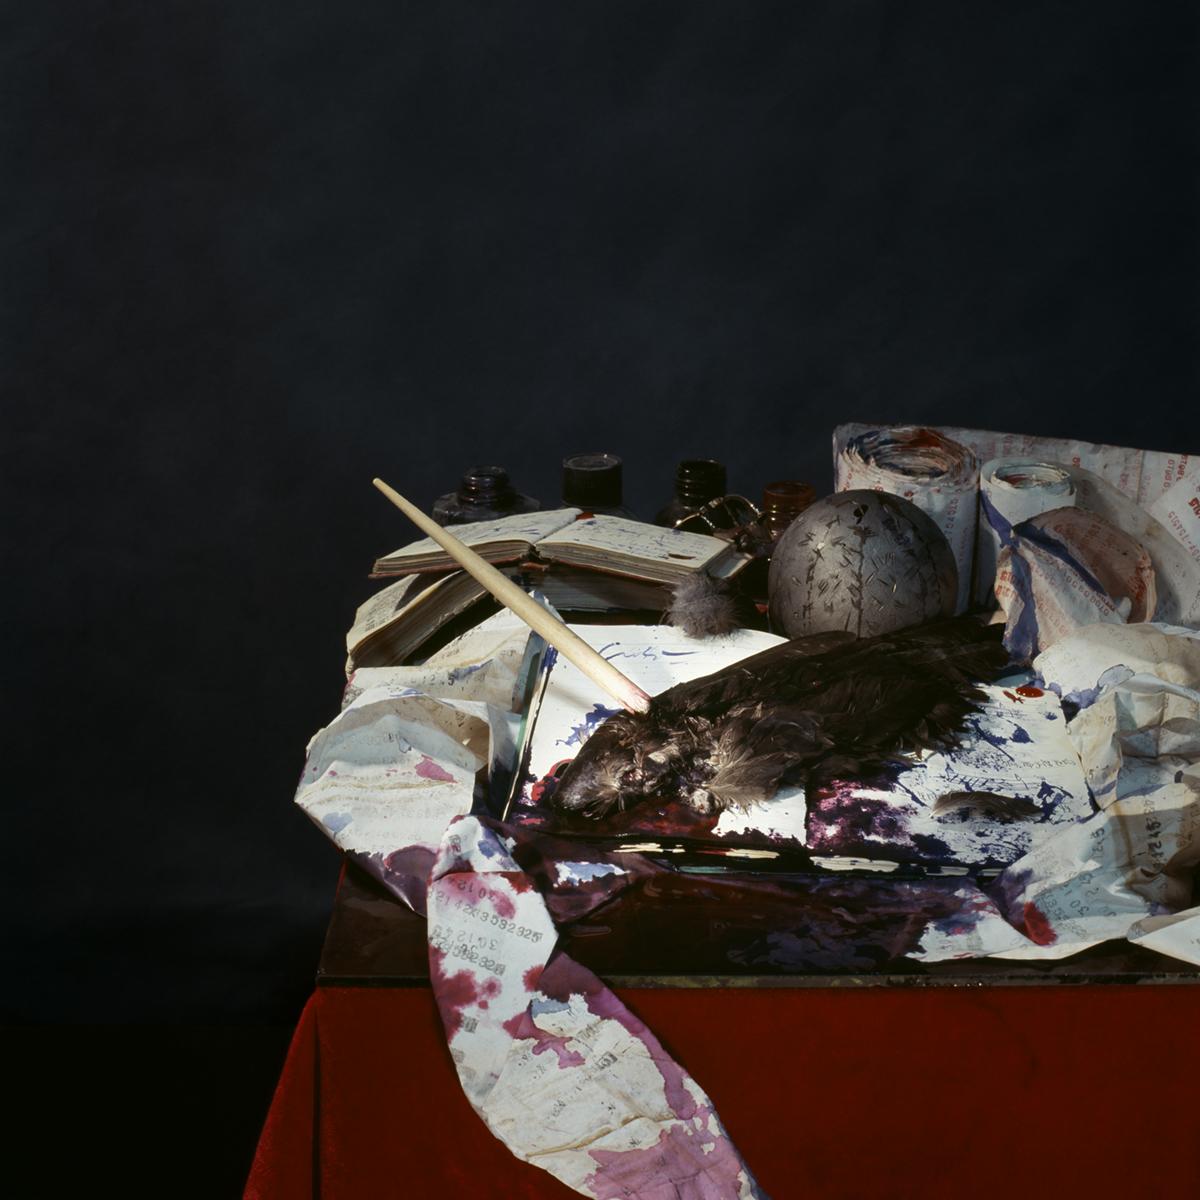 Chen Wei 陈维, The Augur's Game No.1, 2007, Archival inkjet print 收藏级艺术微喷, 80 x 80 cm